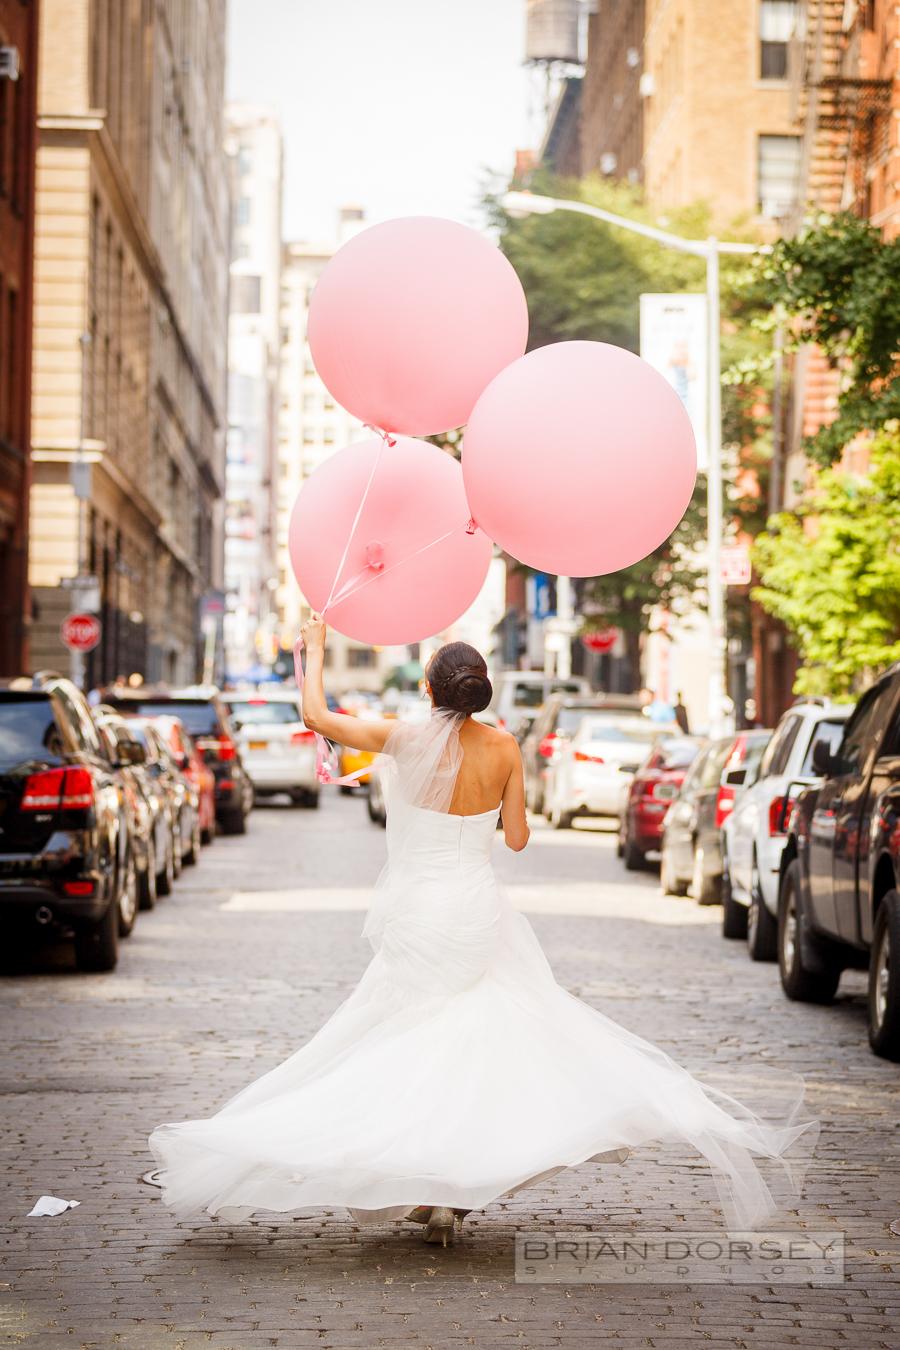 isola nomo soho hotel wedding brian dorsey studios ang weddings and events-12.jpg